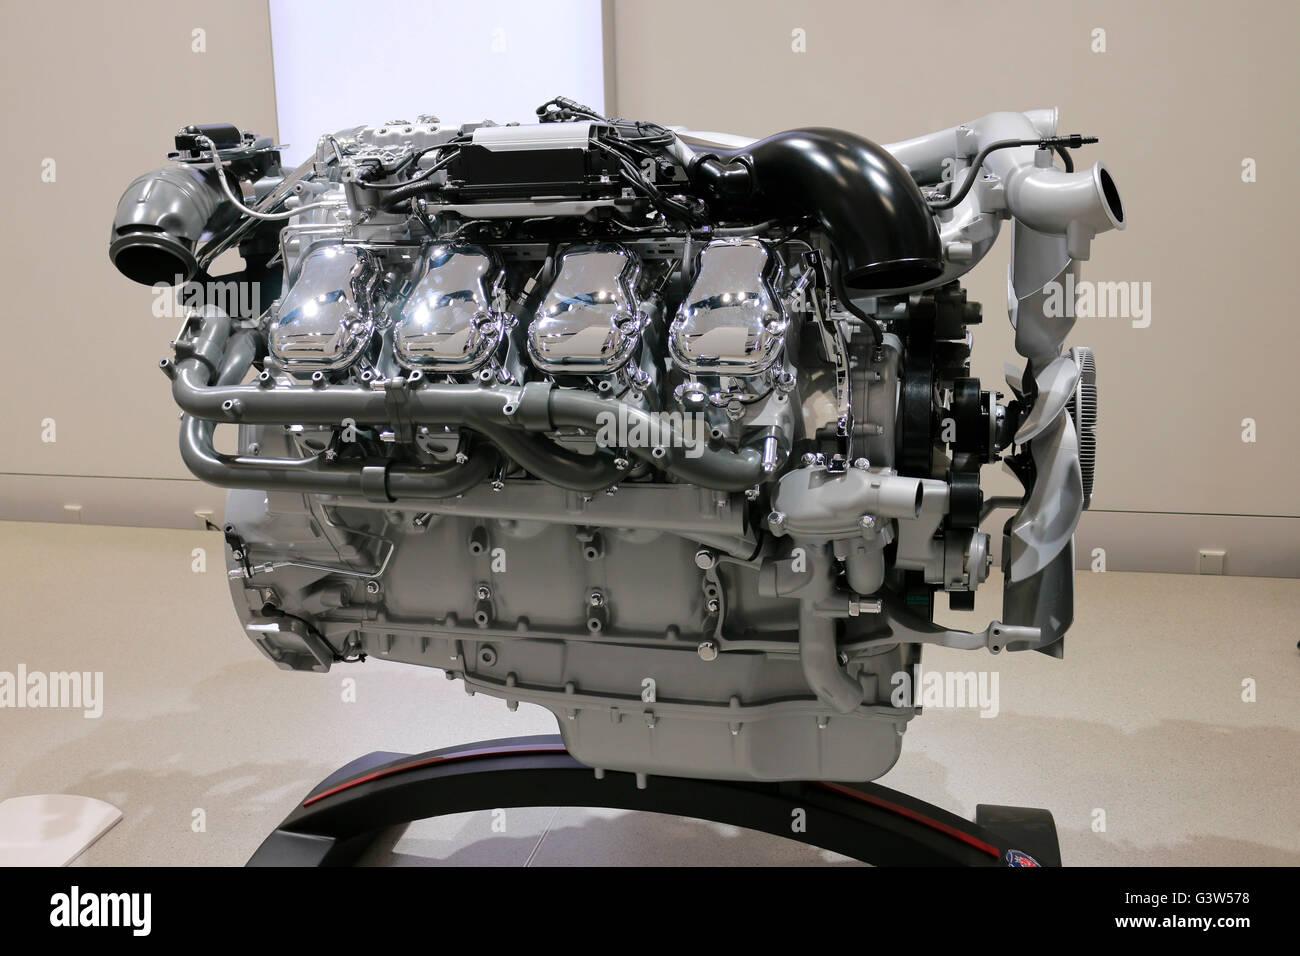 ein VW/ Volkswagen Hybrid-Motor, Berlin. - Stock Image